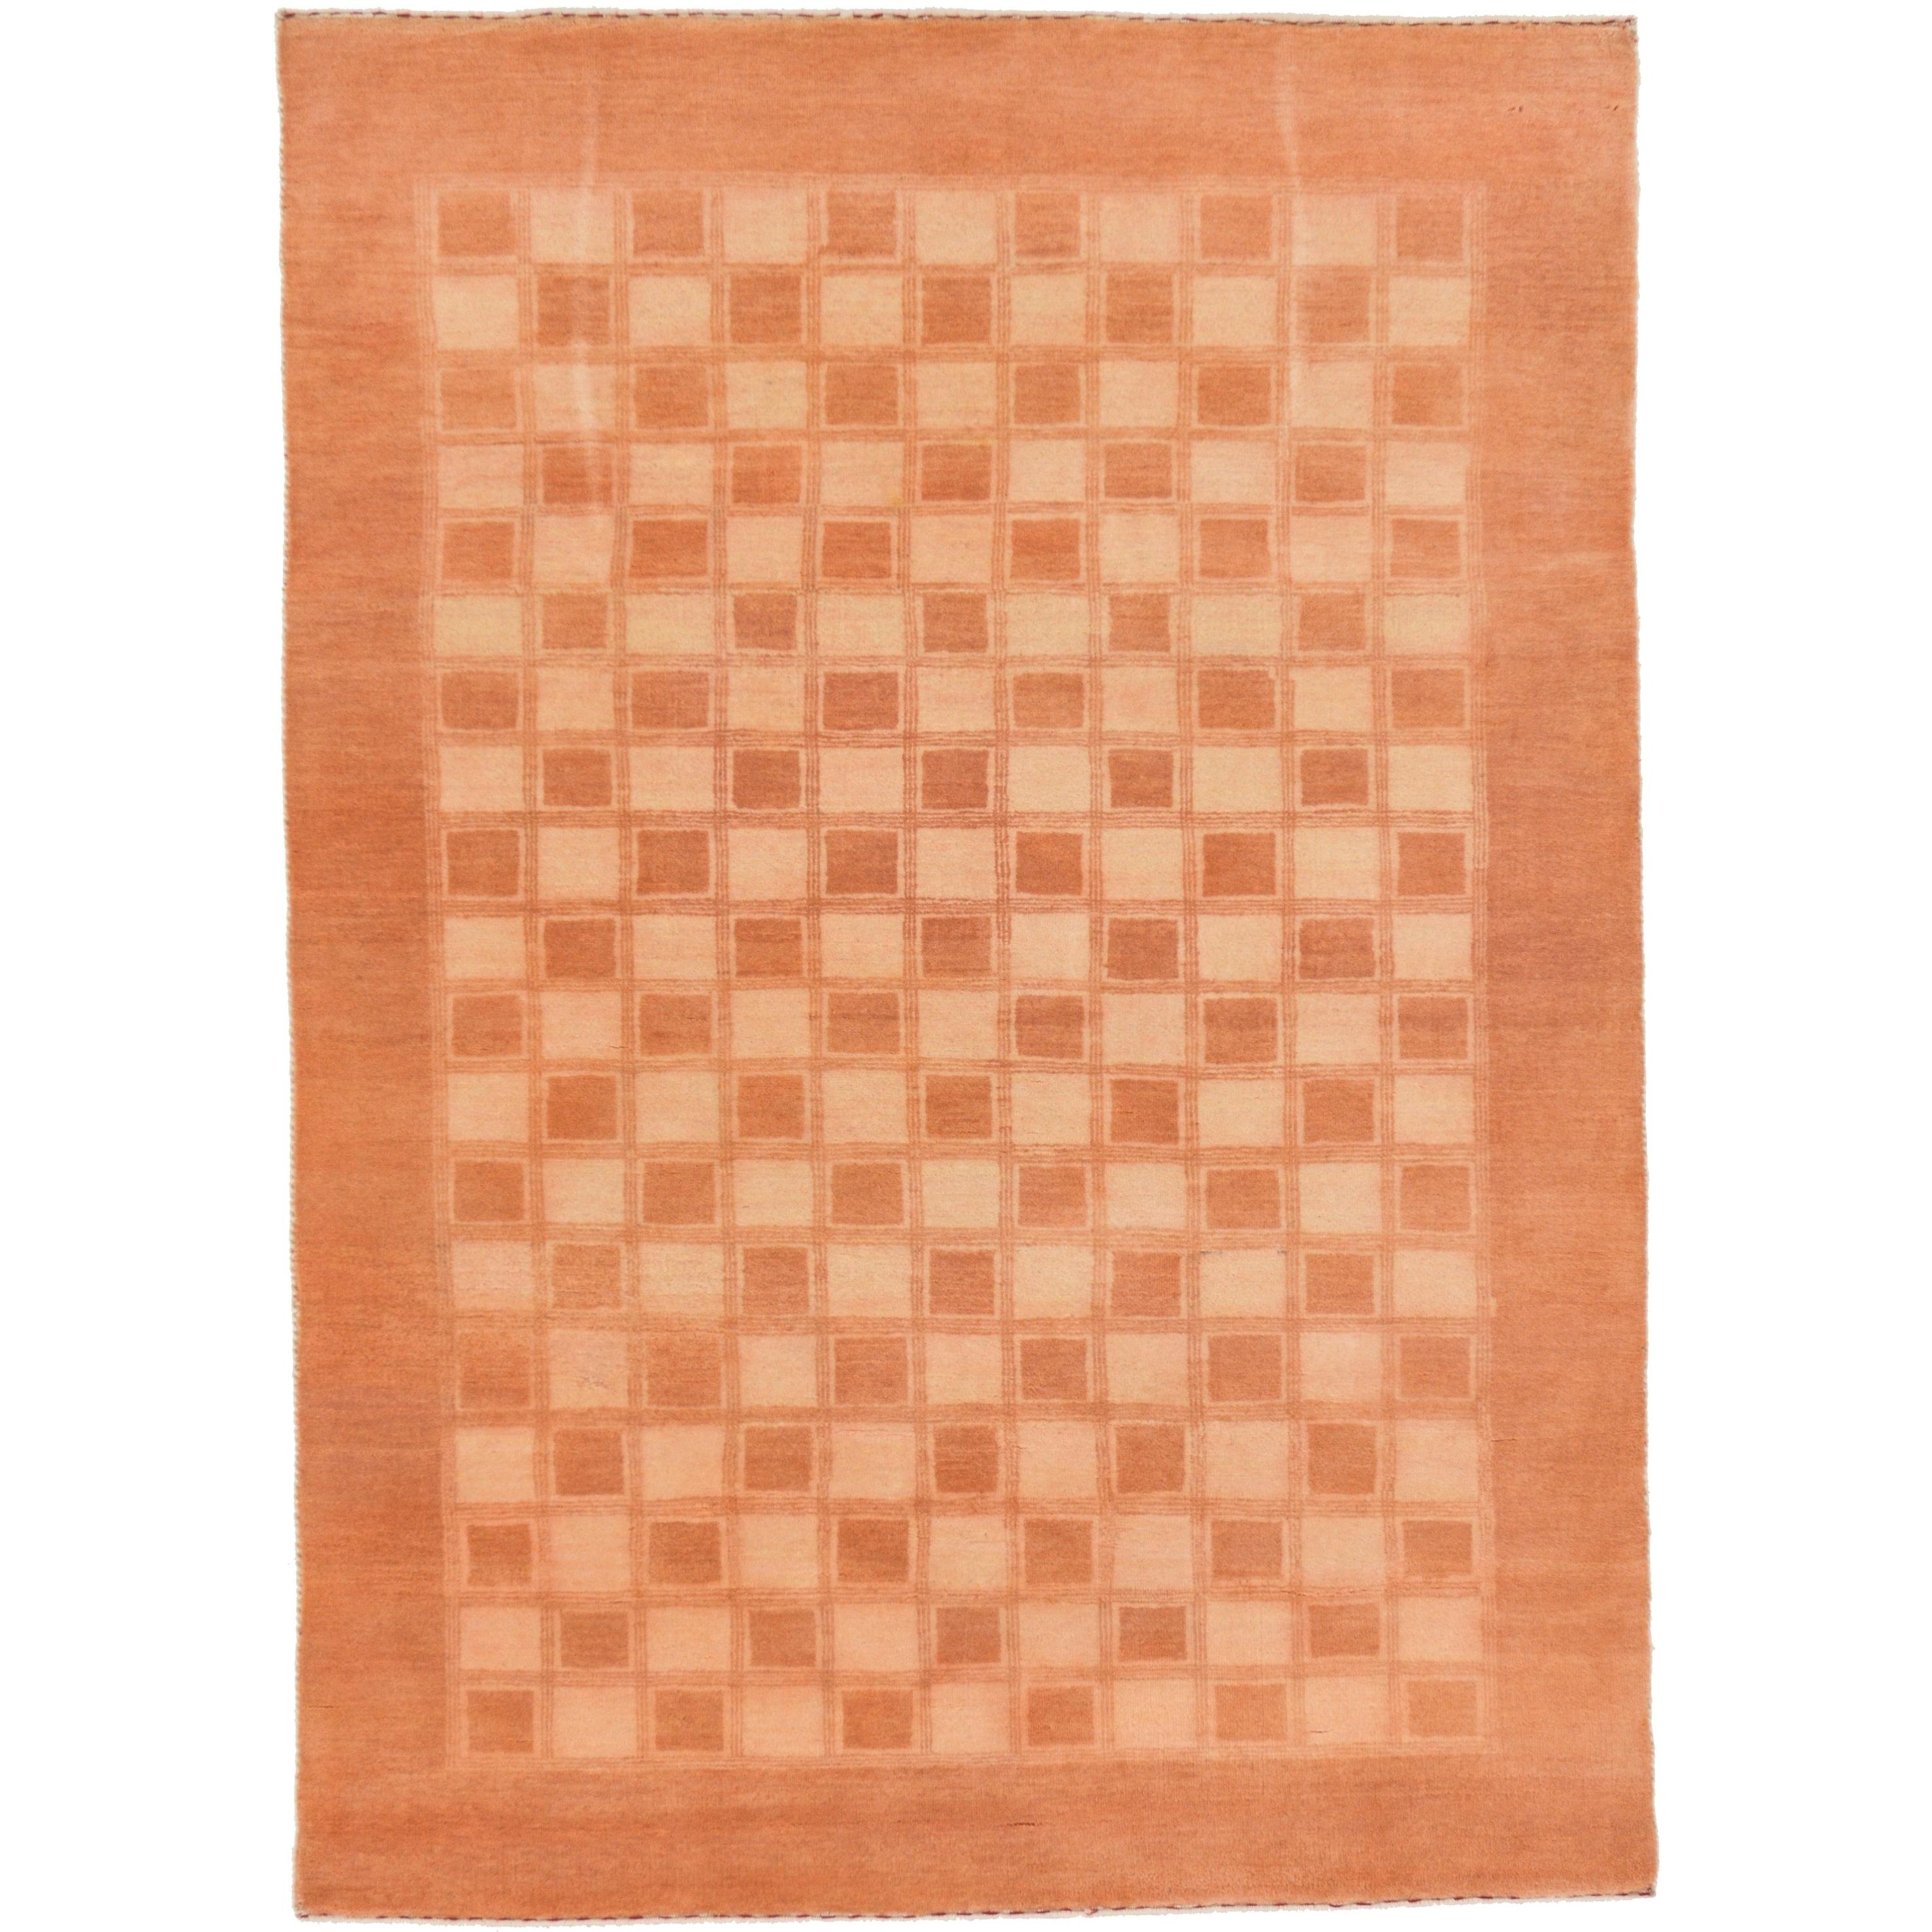 Hand Knotted Kashkuli Gabbeh Wool Area Rug - 4 x 5 8 (Beige - 4 x 5 8)